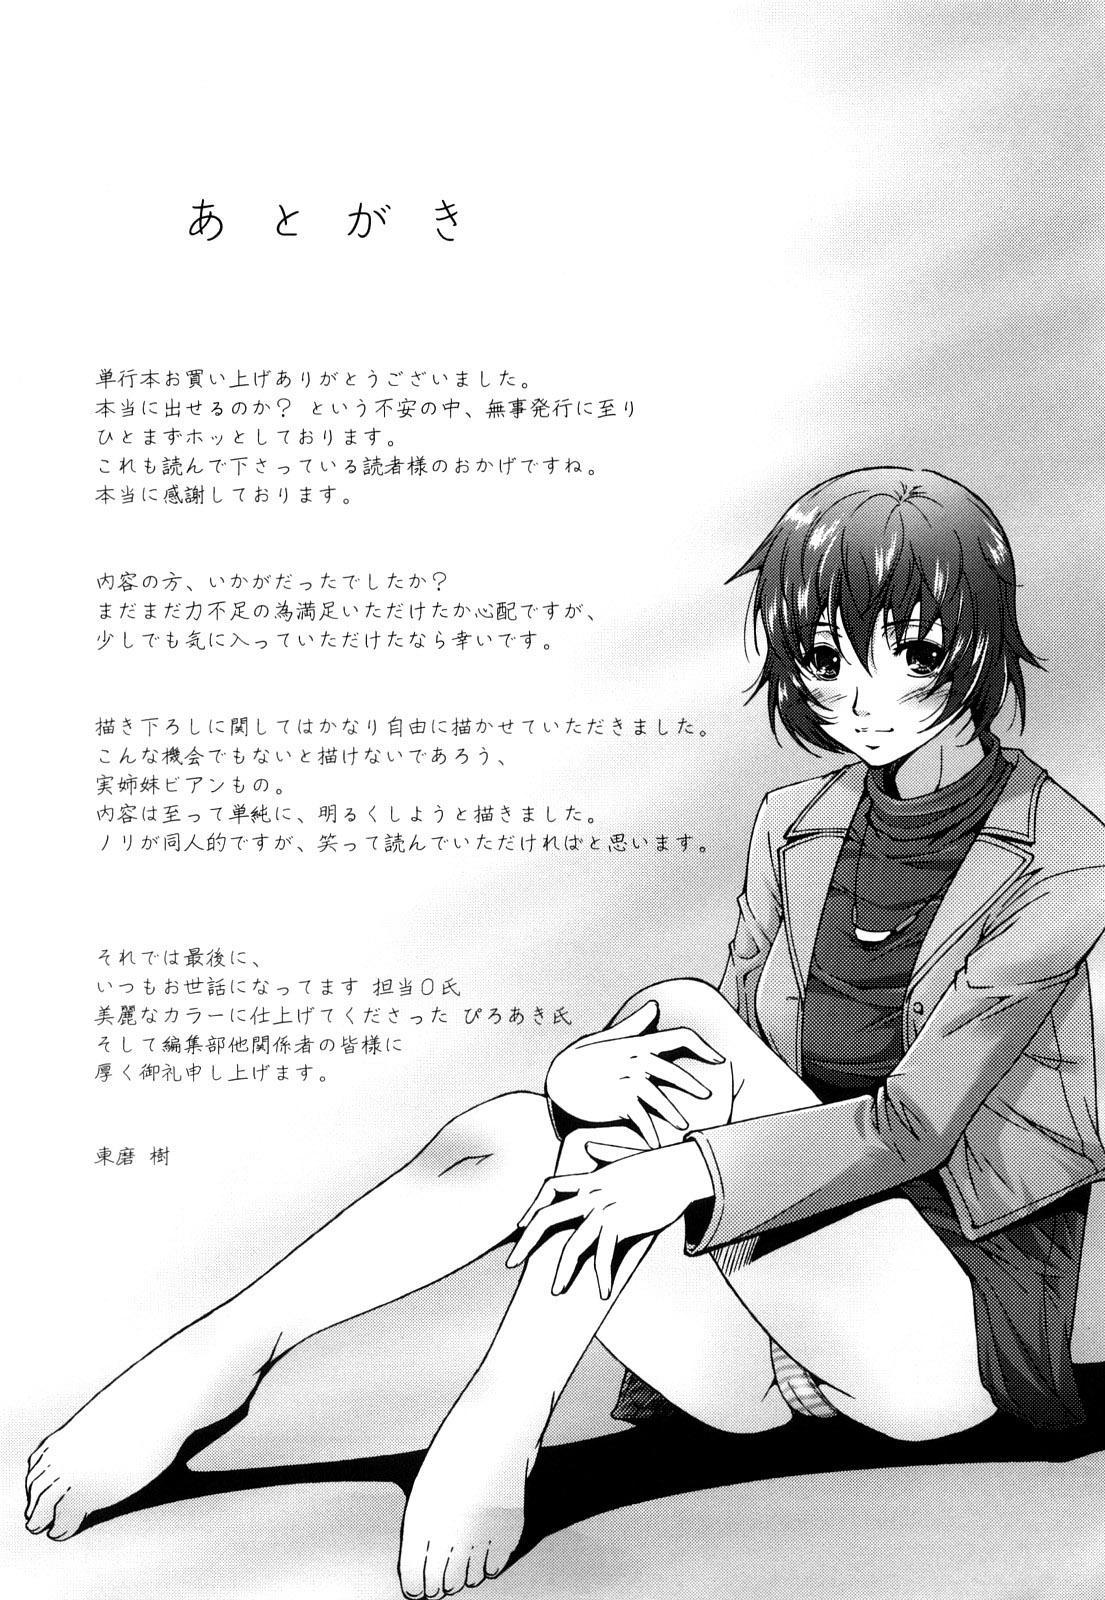 [Touma Itsuki] Ane-sama Inkou - Sister's Sexy Smell [English] {desudesu} 202